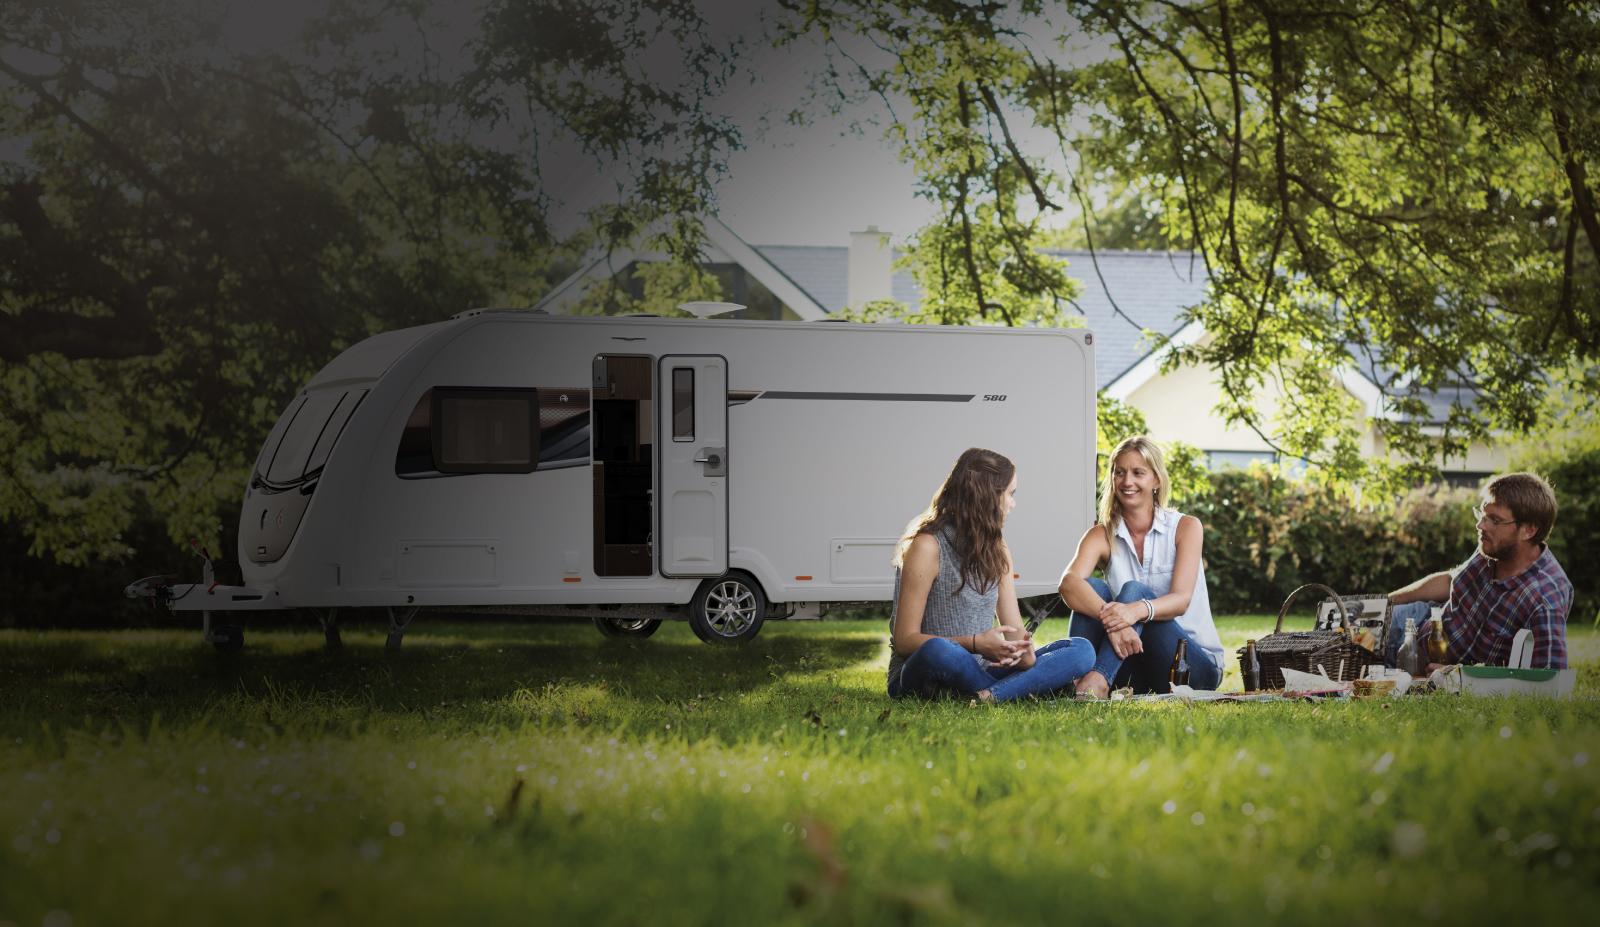 Used Caravans & Second Hand Caravans for Sale